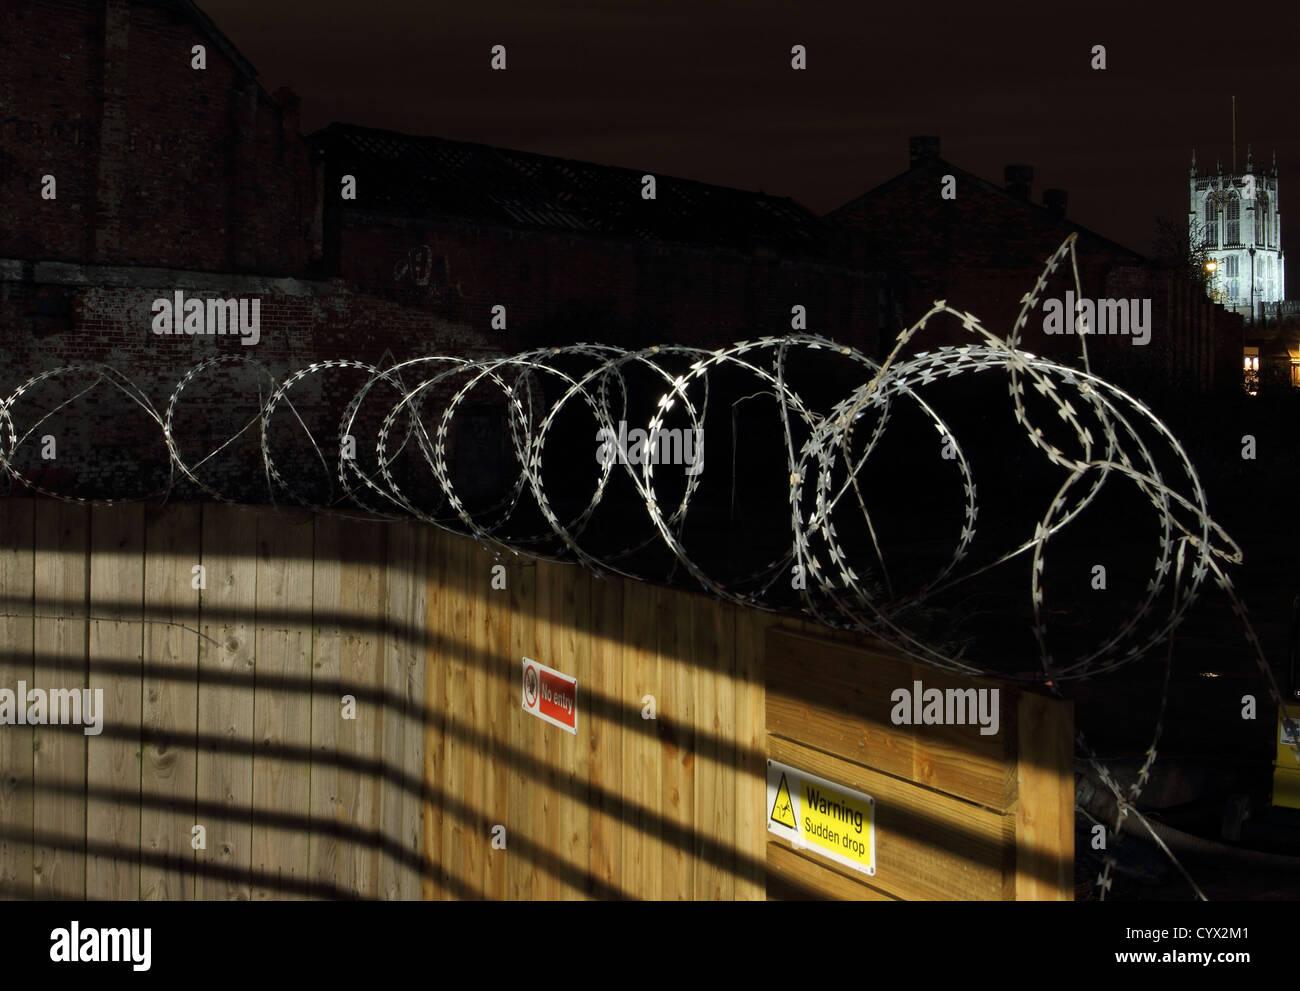 a razor wire fence - Stock Image